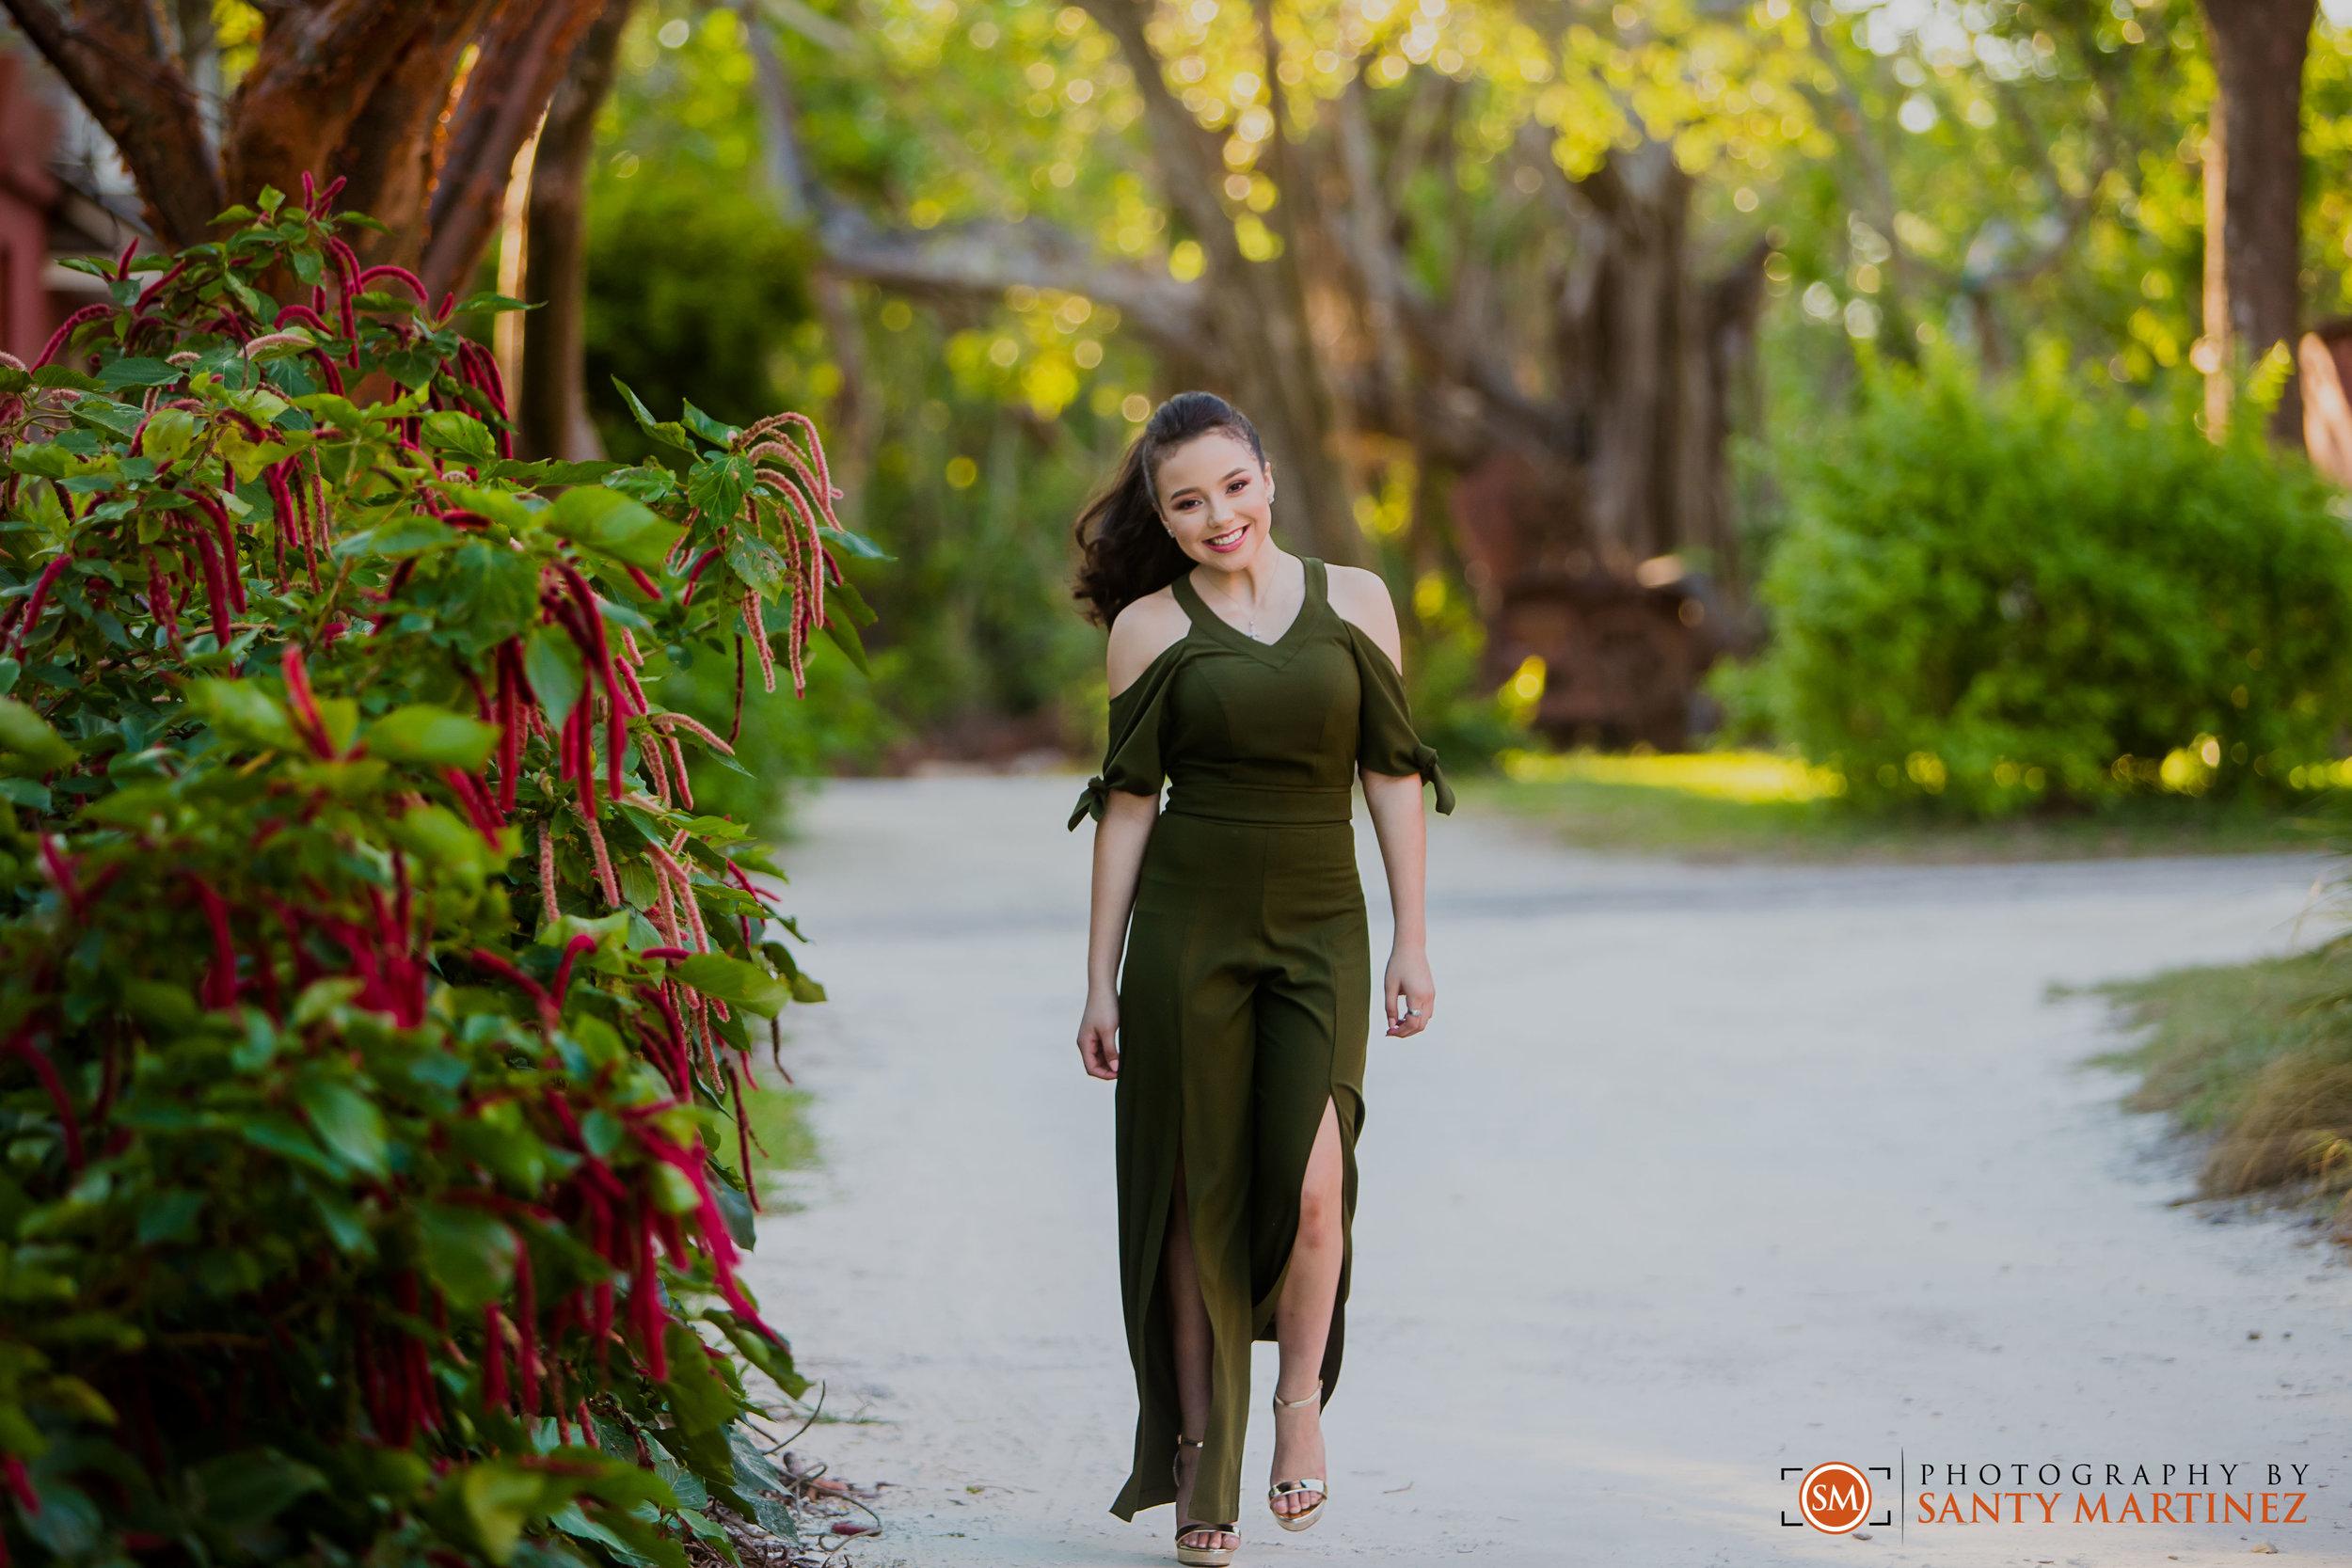 Quinces - Miami - Deering Estate - Santy Martinez Photography-21.jpg